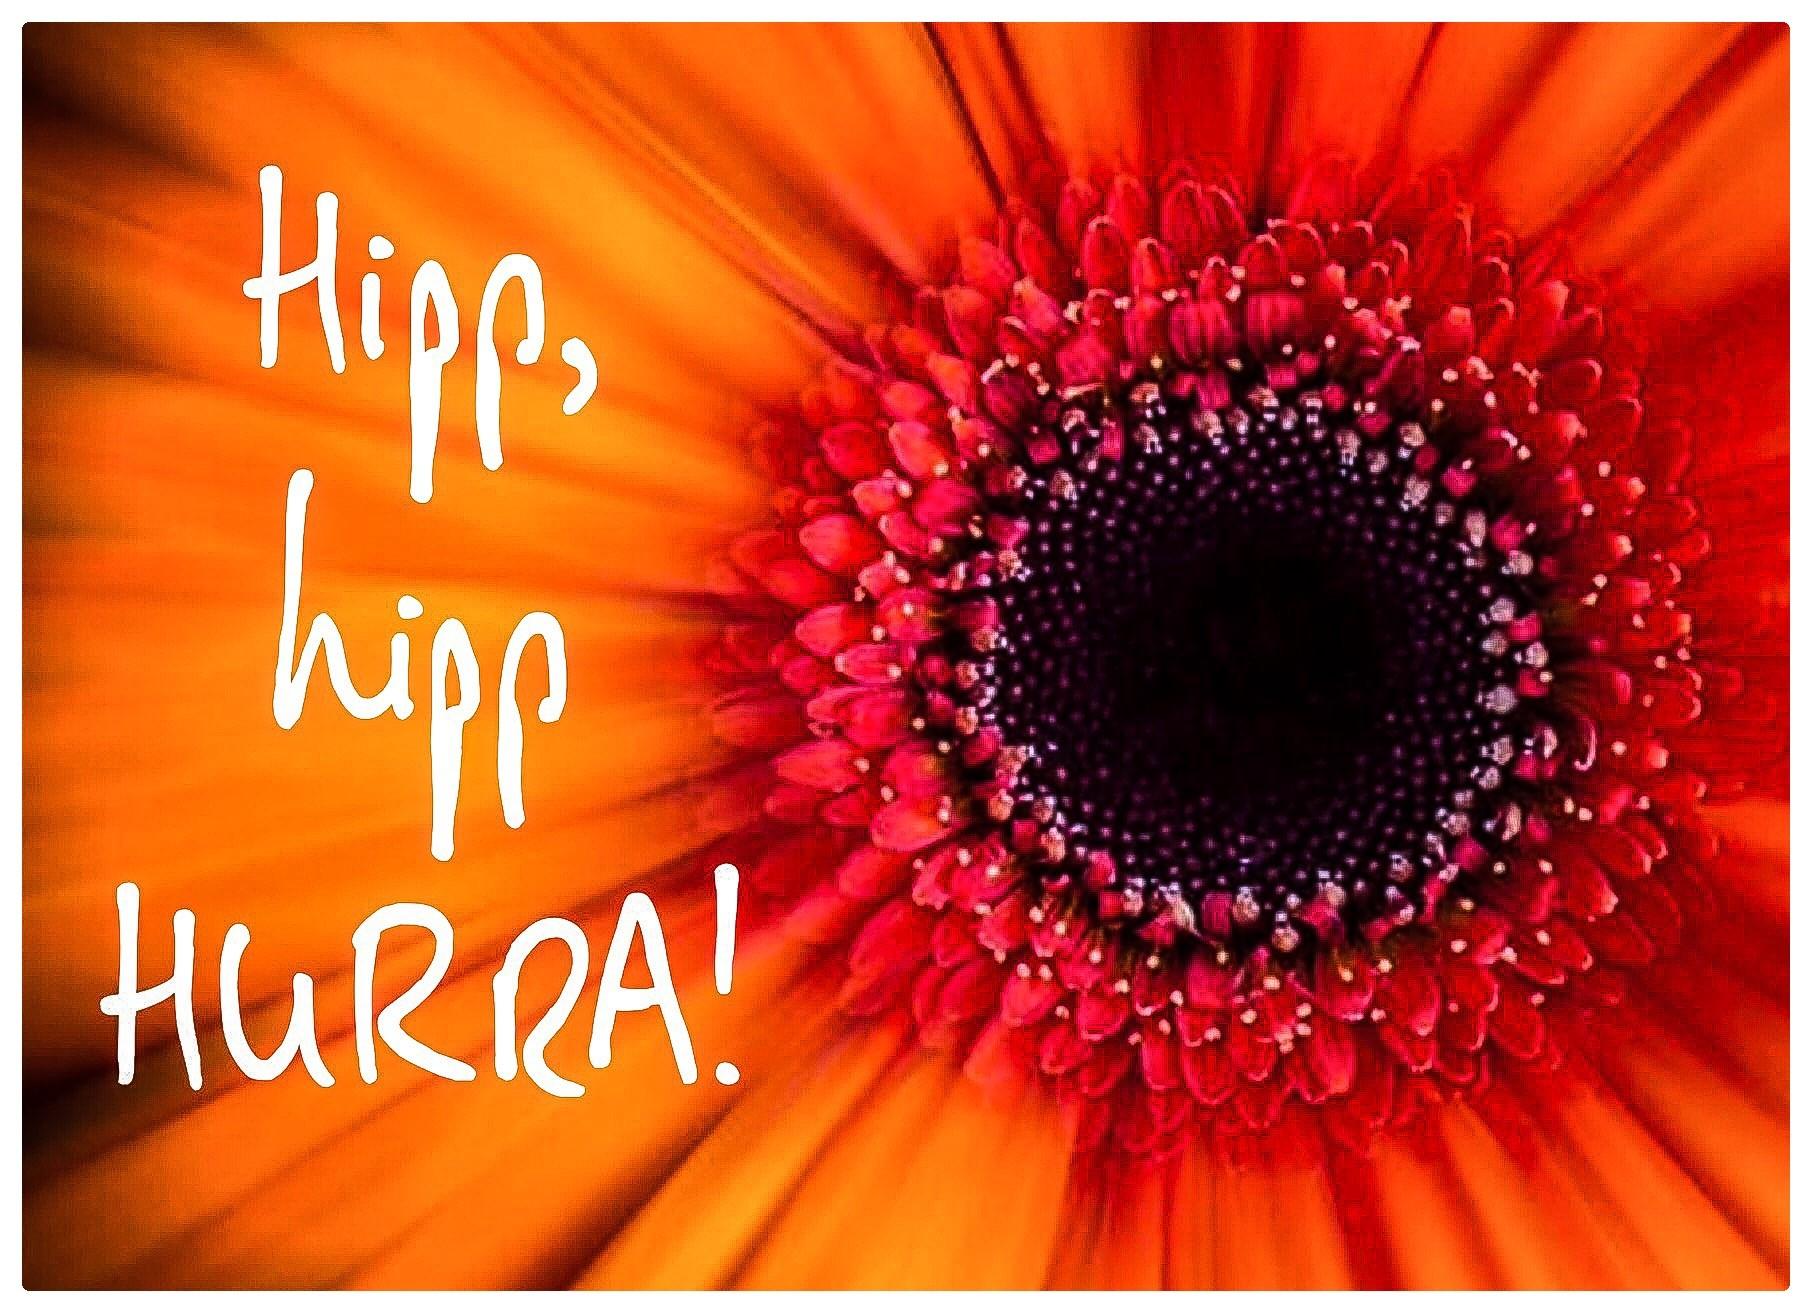 Hipp hipp hurra 20-kortpakke (002).jpg